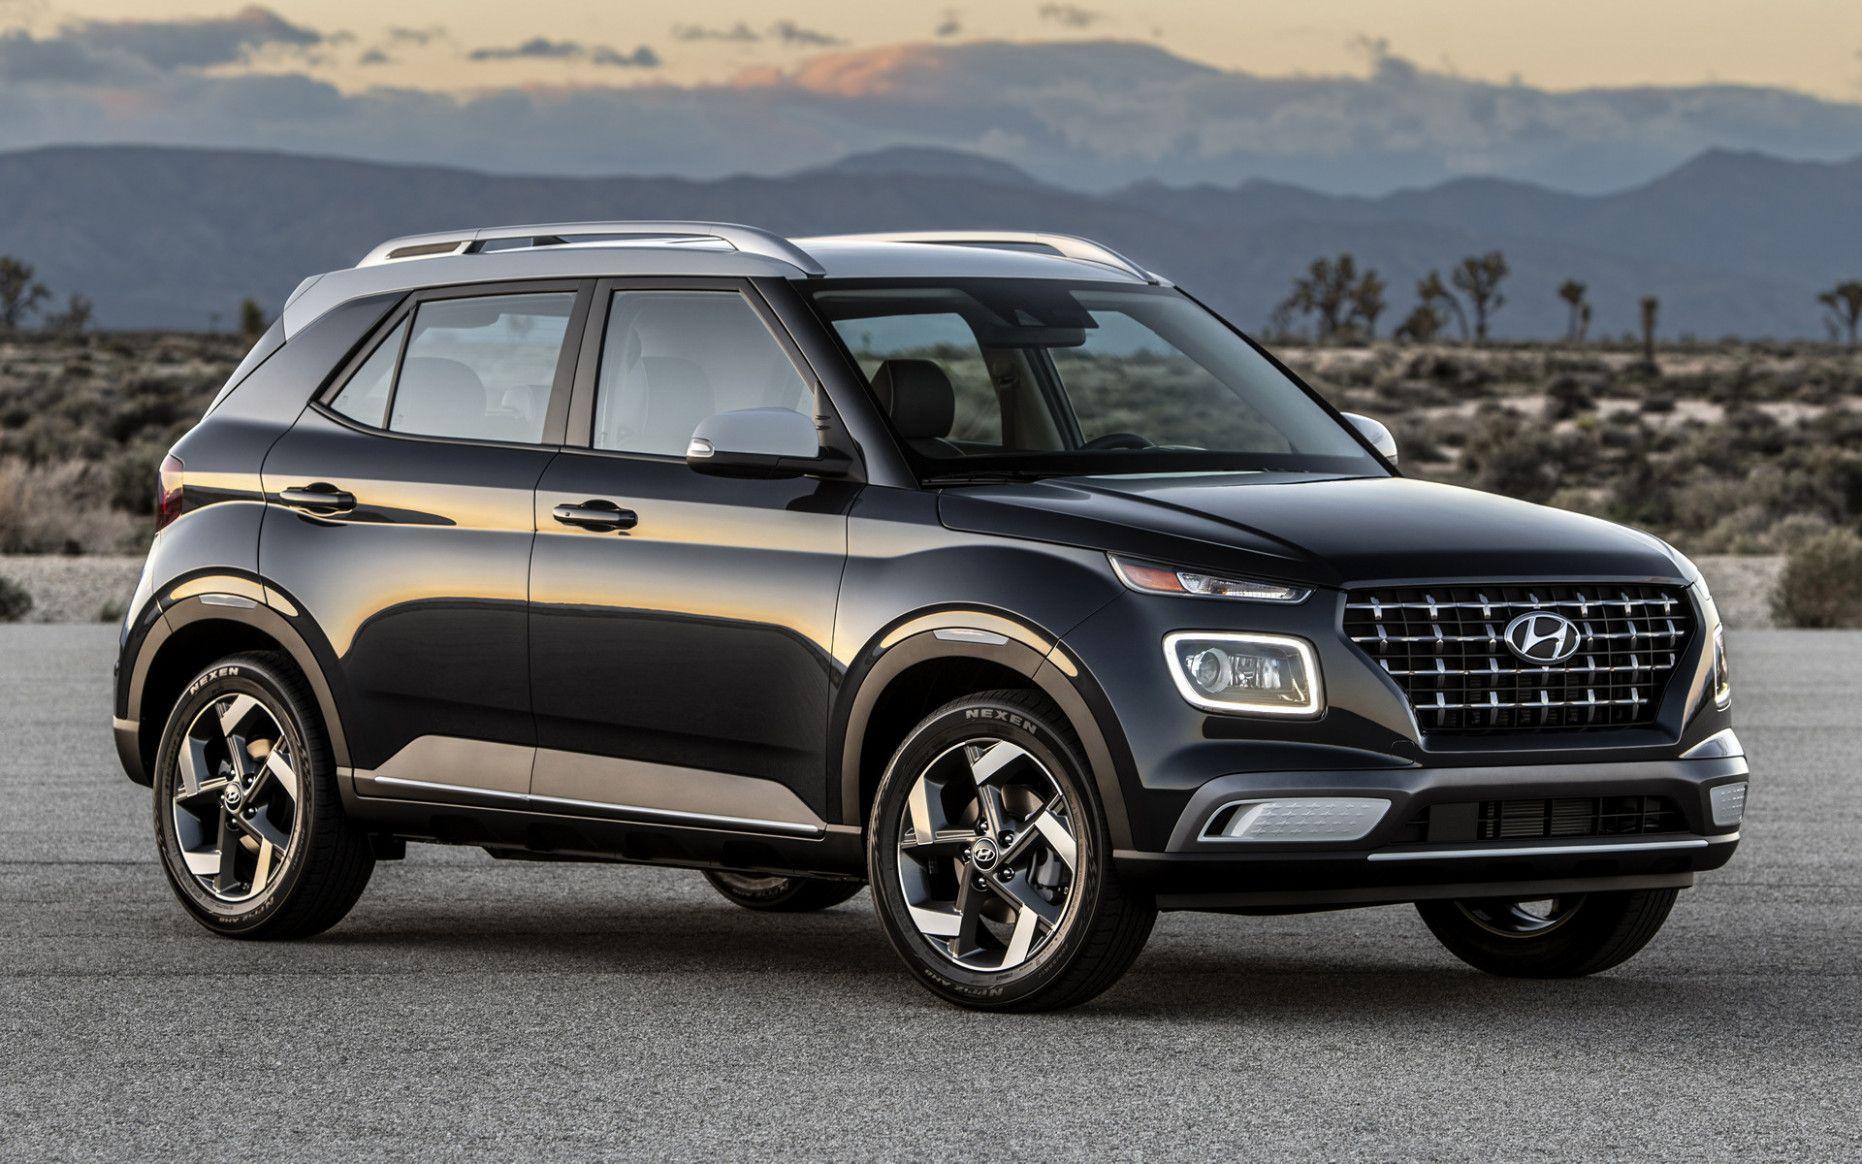 11 Wallpaper Hyundai New Car 2020 Venue in 2020 New